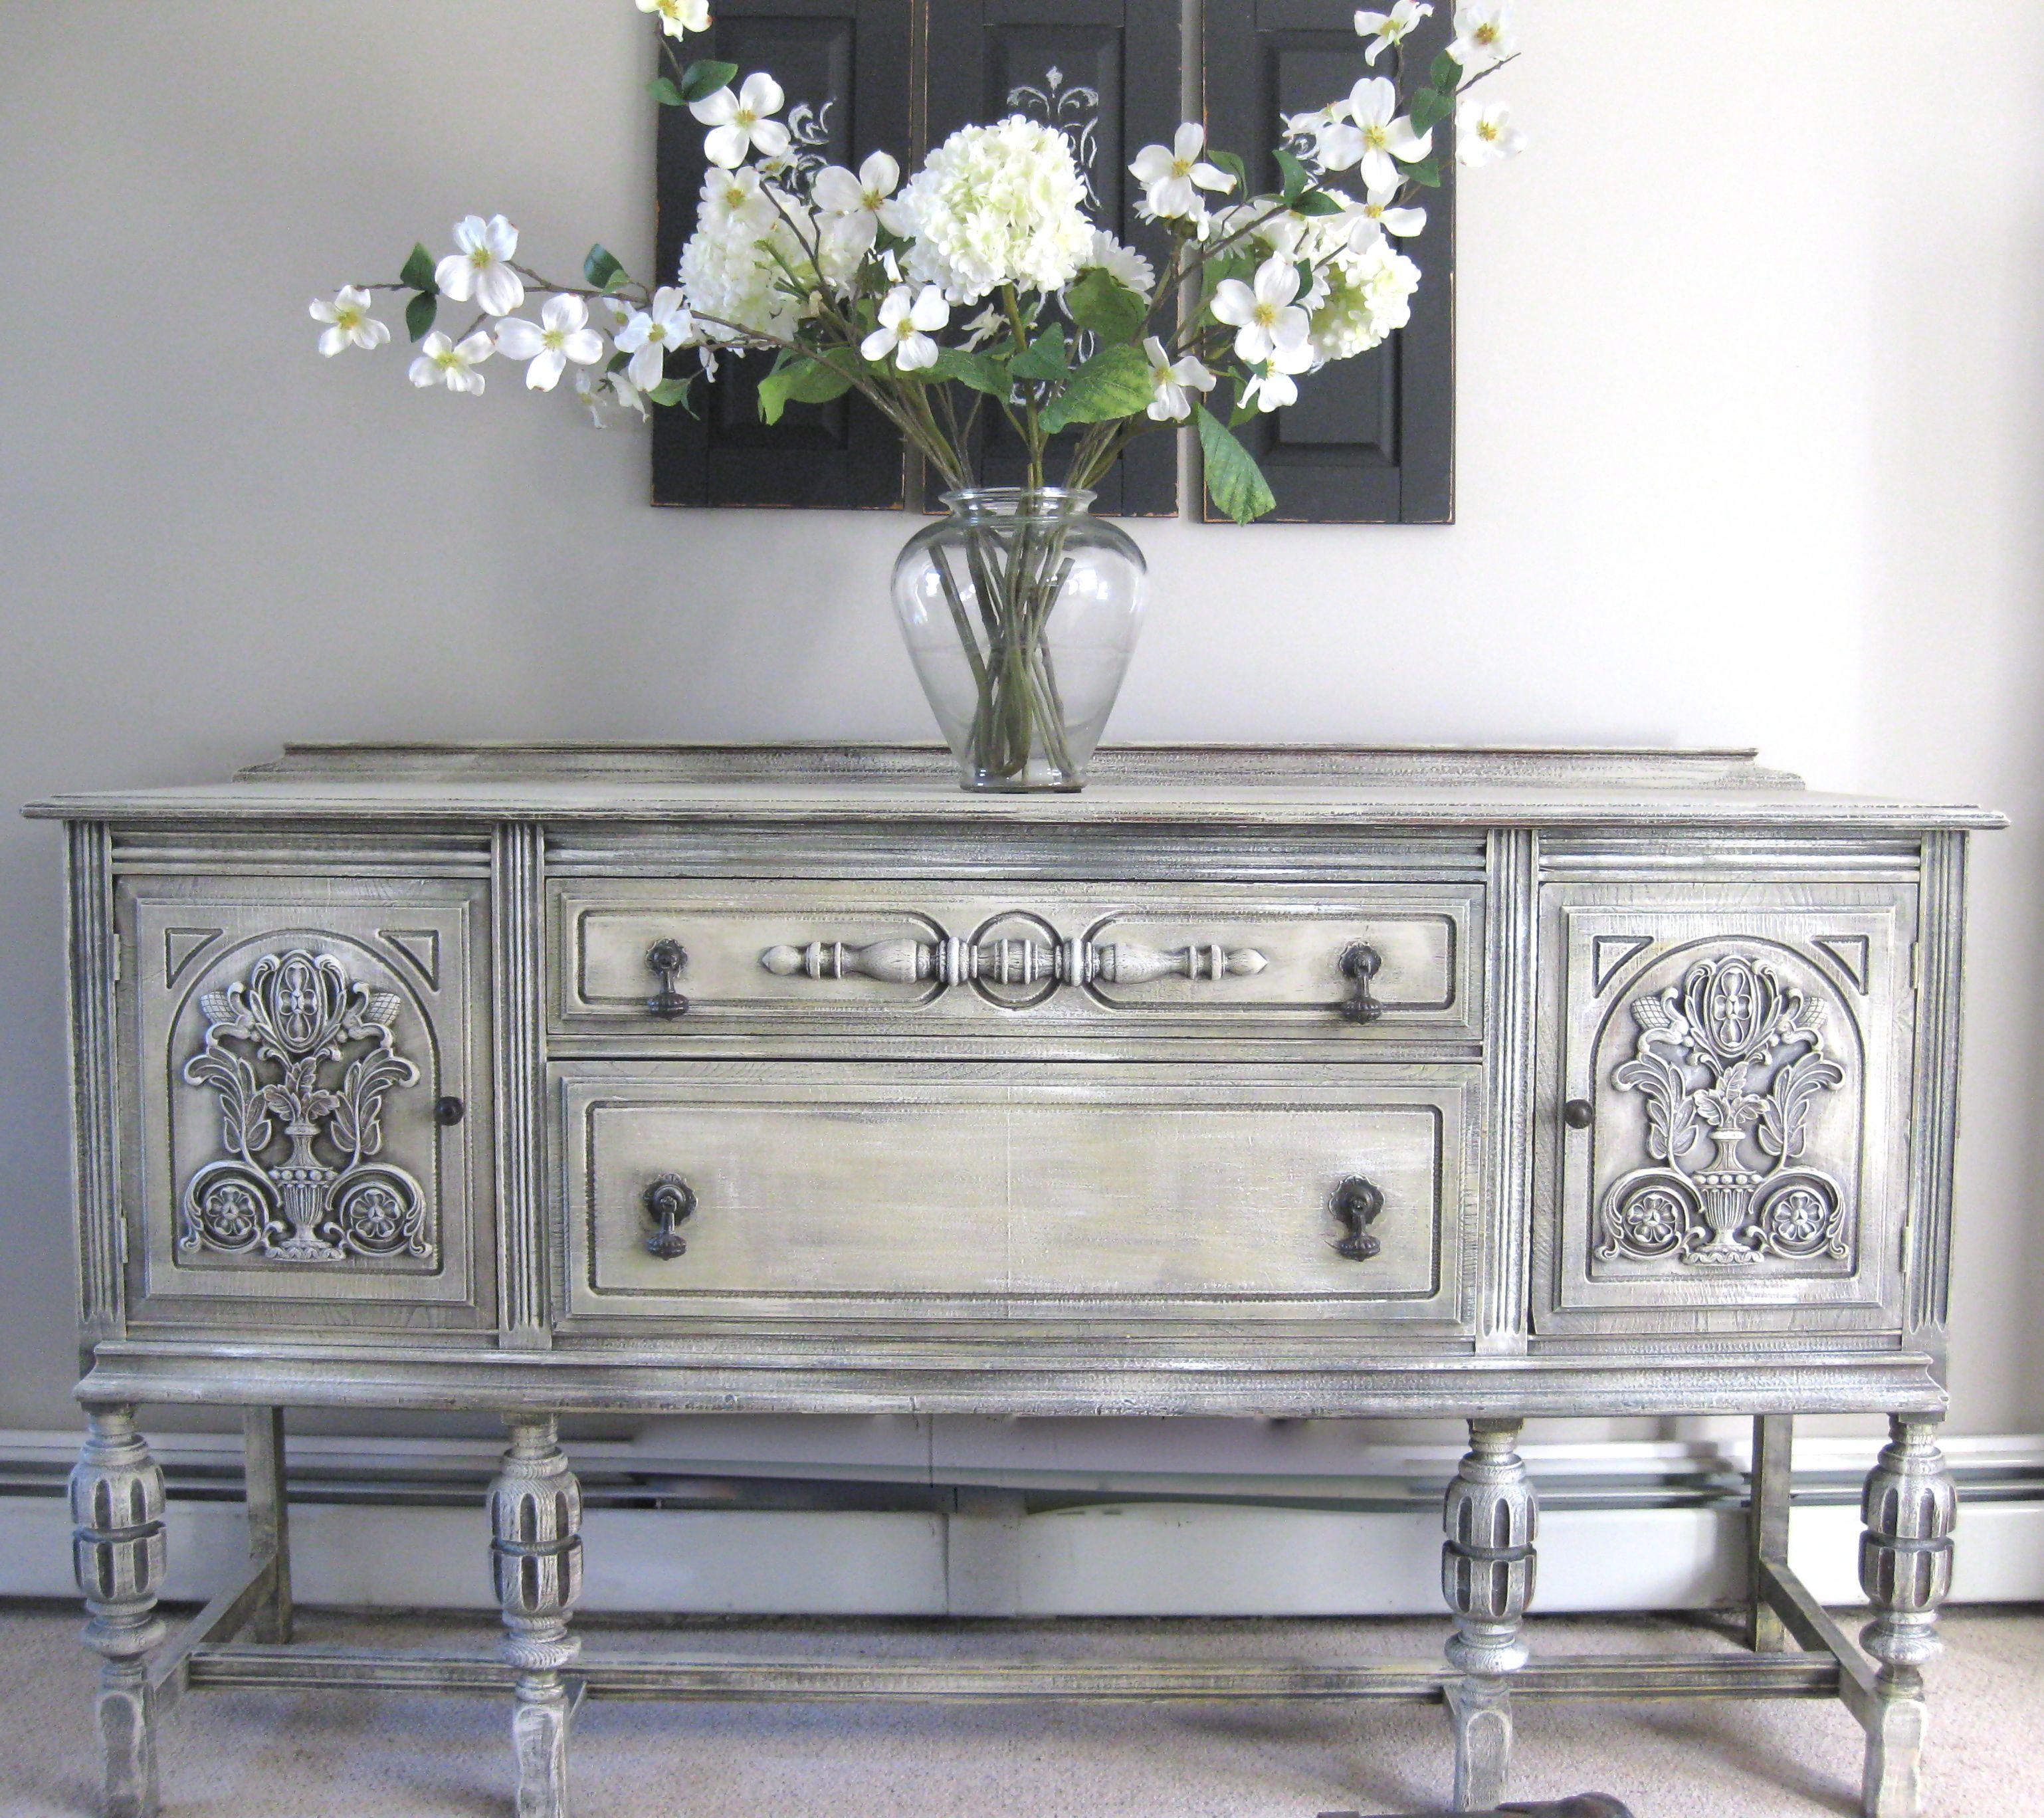 Antique Sideboard Buffet Painted With Annie Sloan Chalk Paint Bemalte Mobel Dekor Antike Anrichte